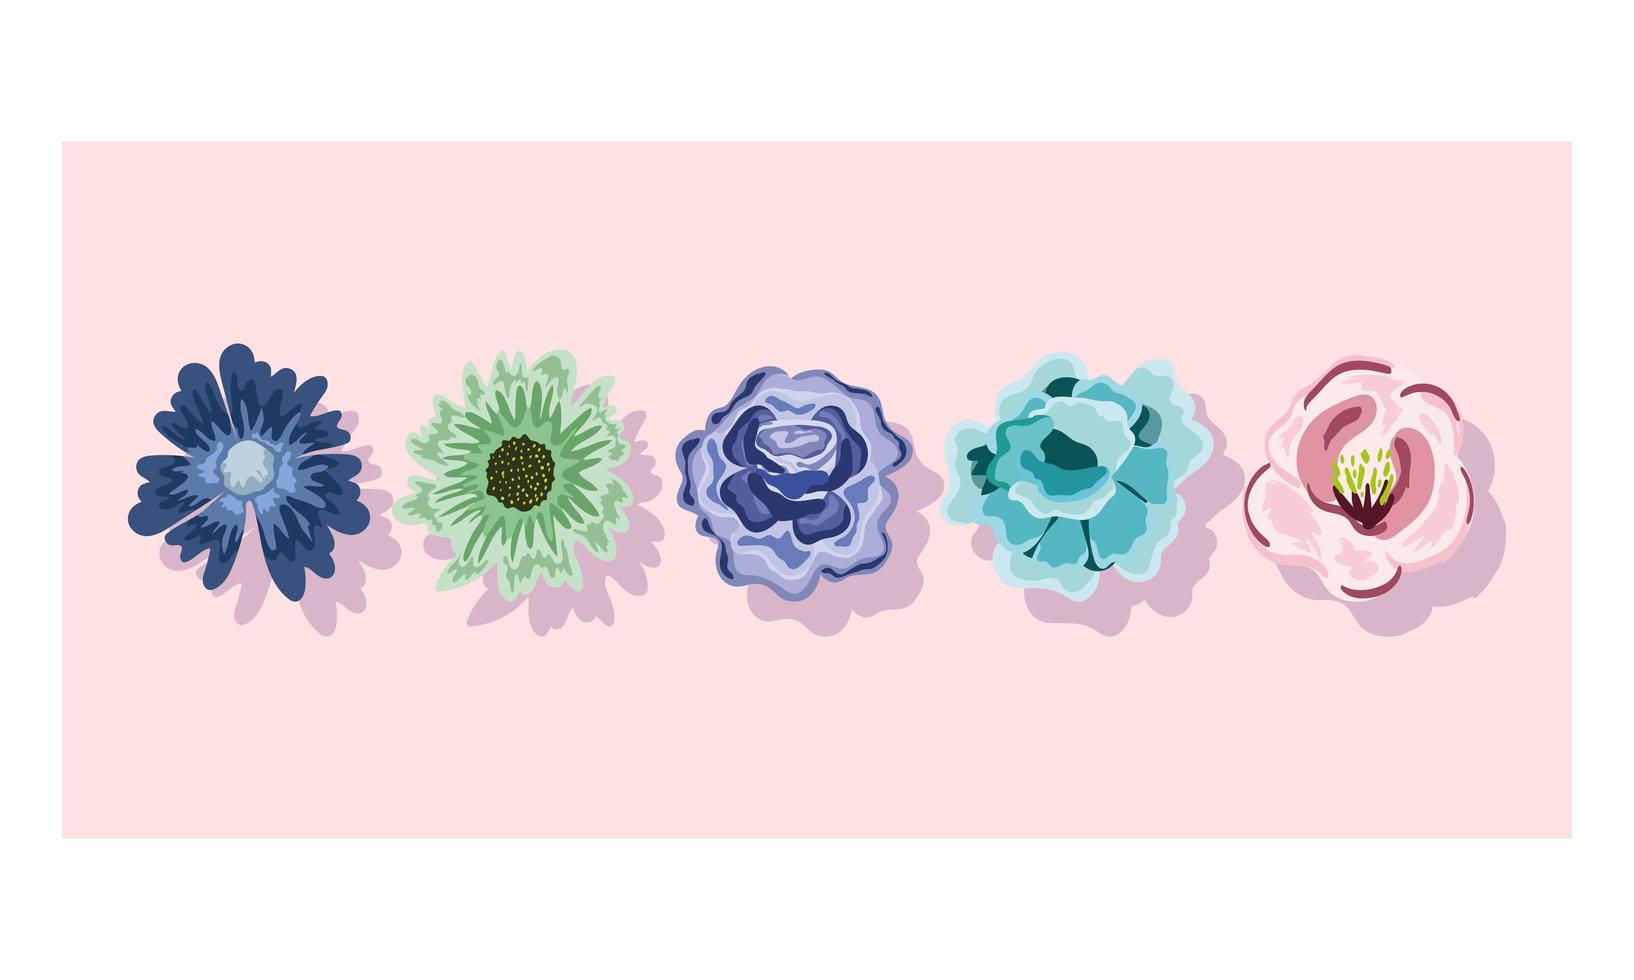 zarte Blumen Dekoration Ornament. Natur Blumenmuster vektor